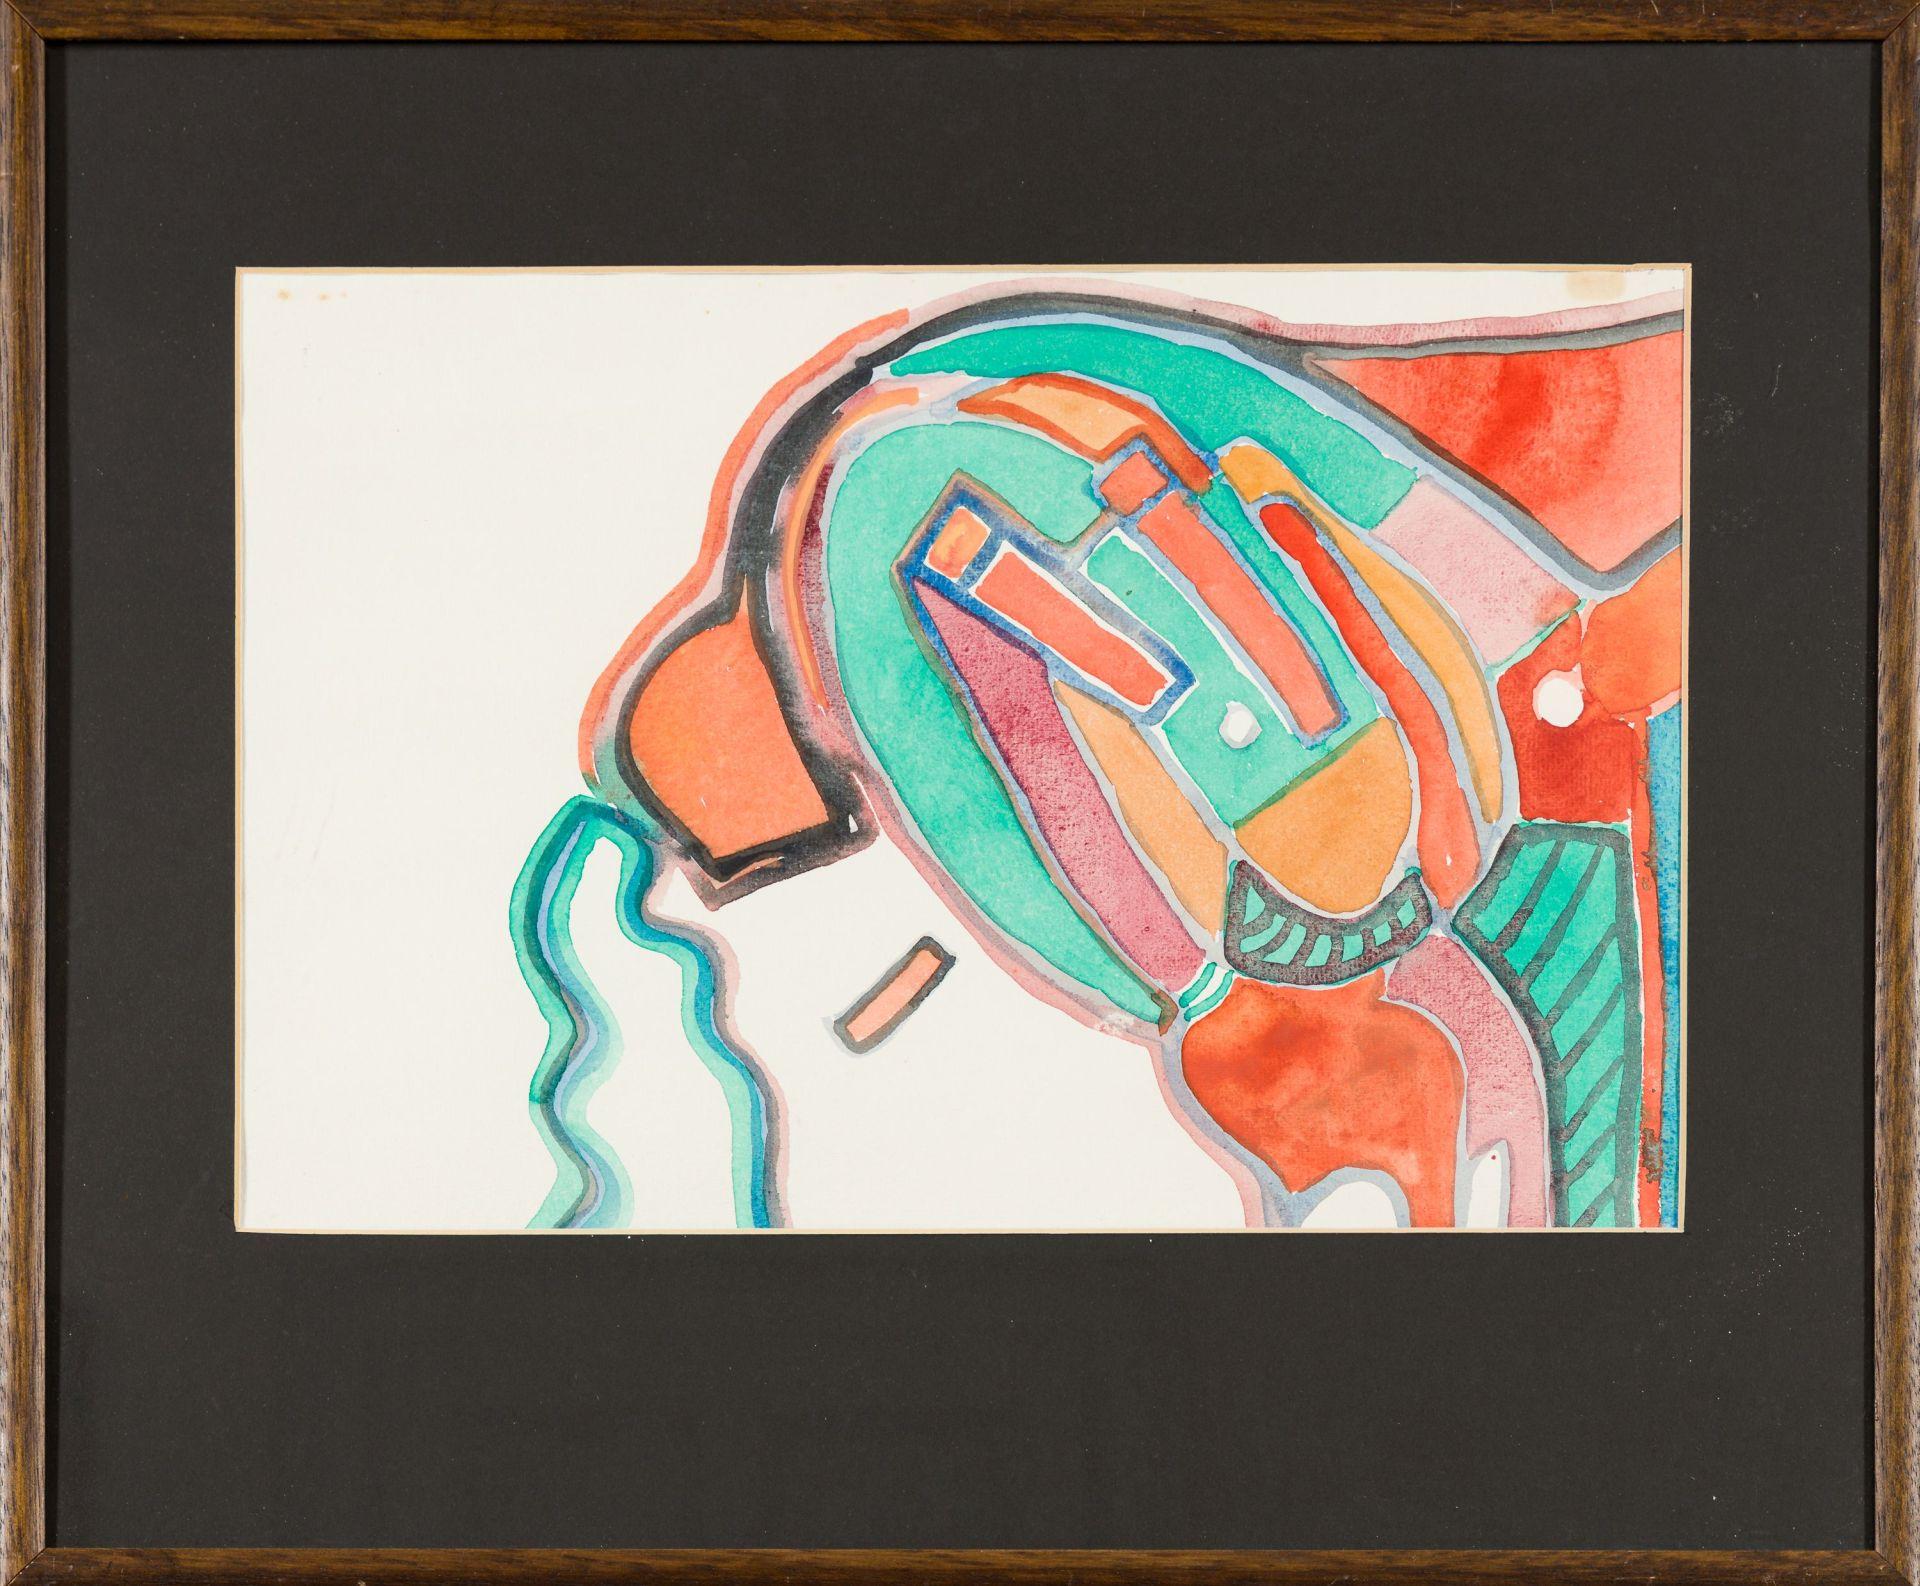 Franz Ecker-Abstraction 1